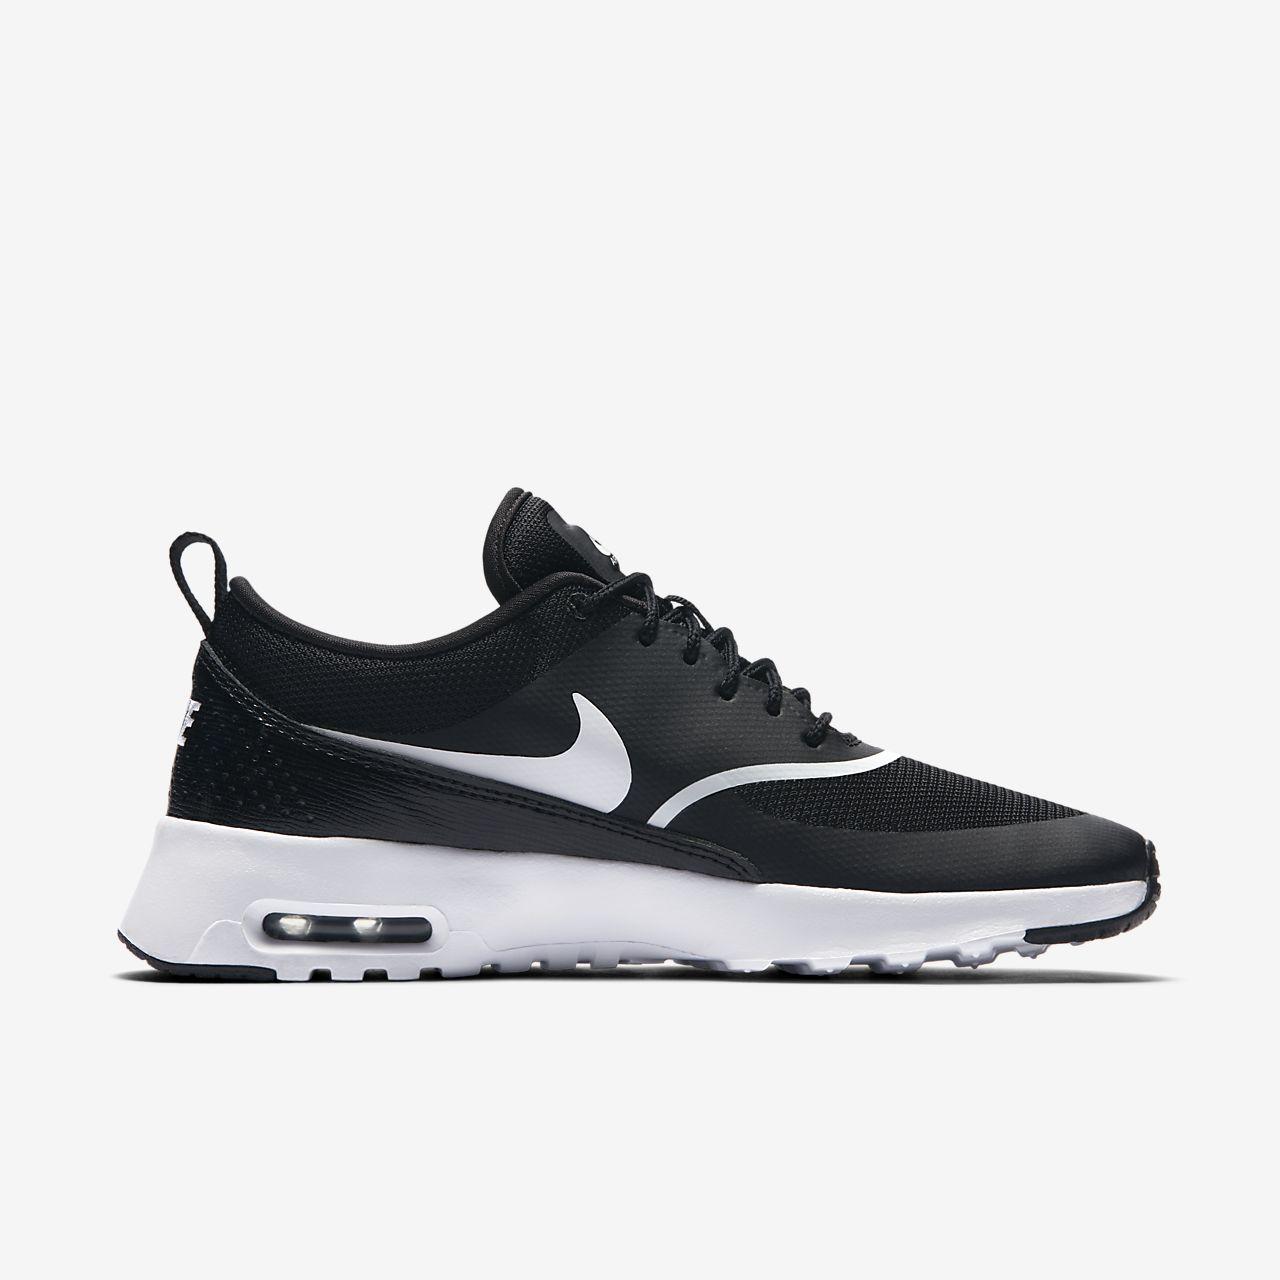 ... Nike Air Max Thea Kadın Ayakkabısı